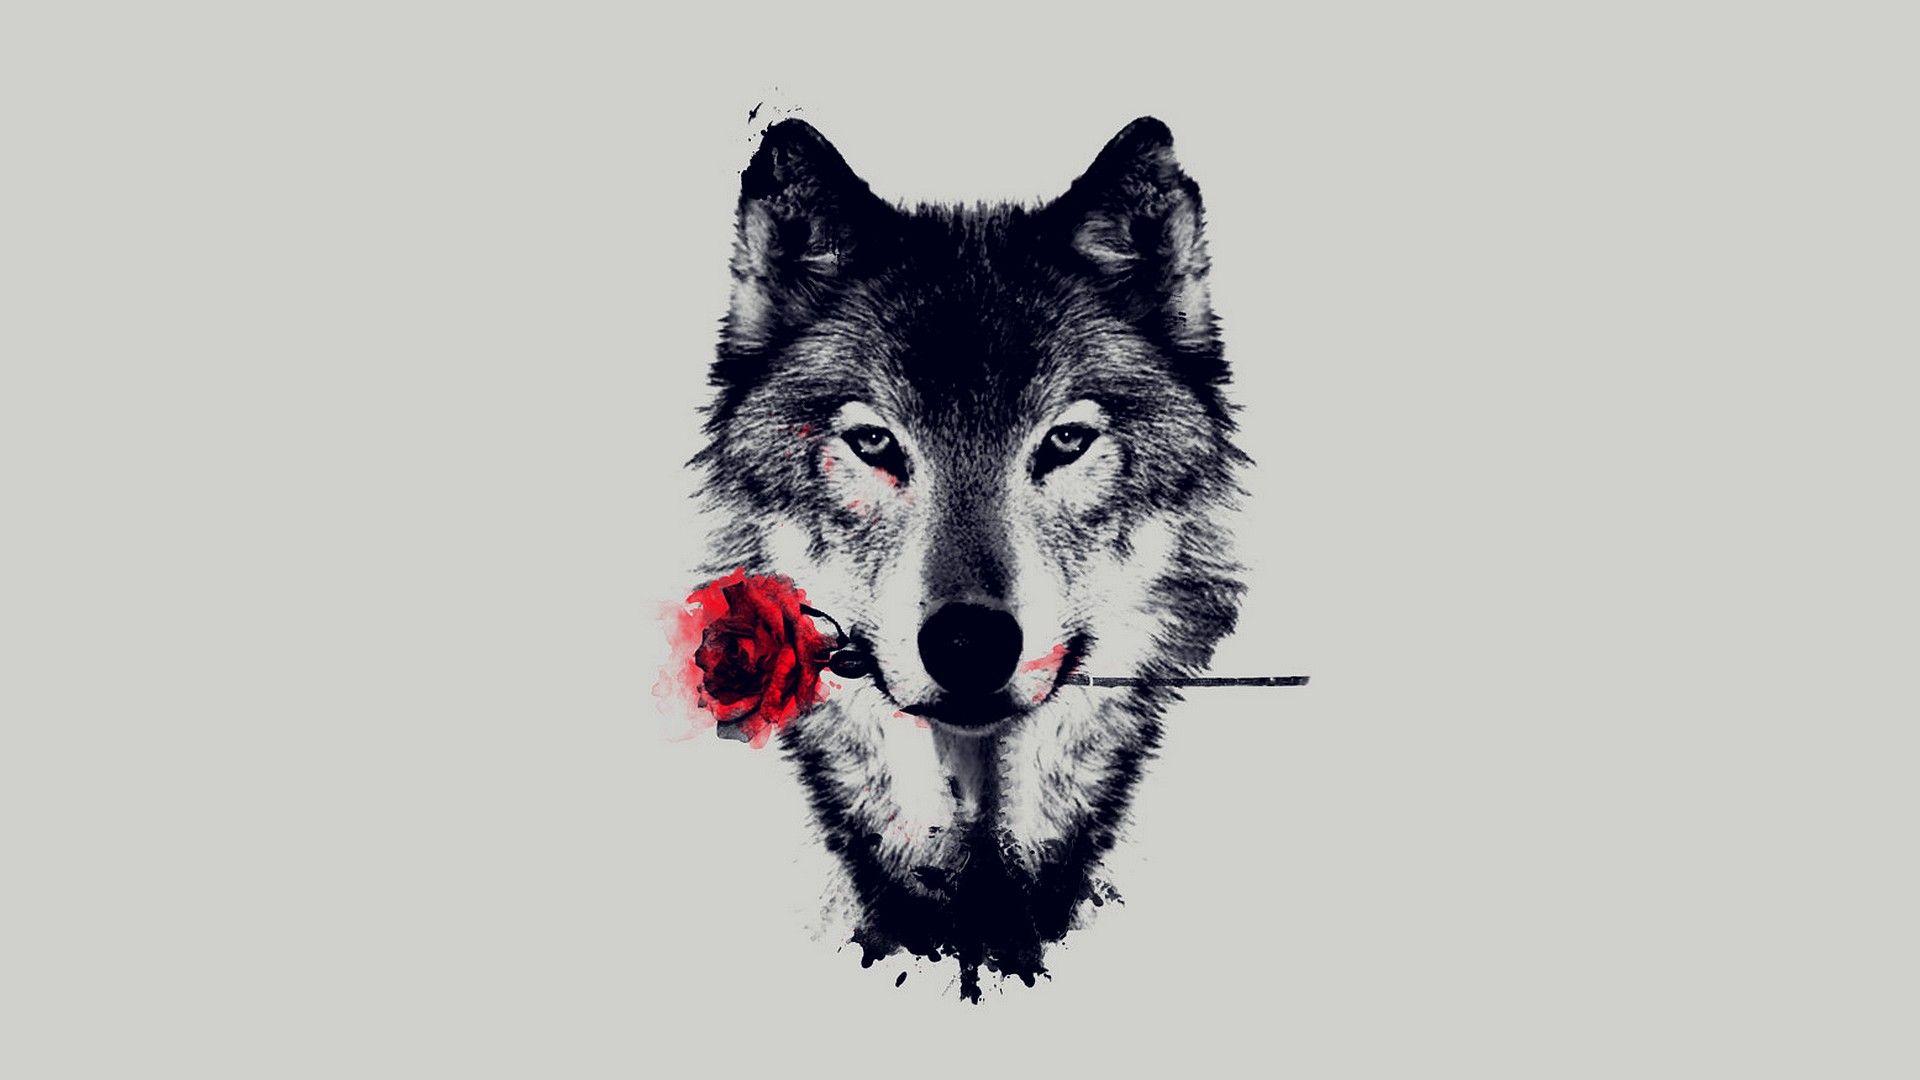 Cool Wolf Hd Wallpaper Wolf Holding A Rose 1920x1080 Wallpaper Teahub Io